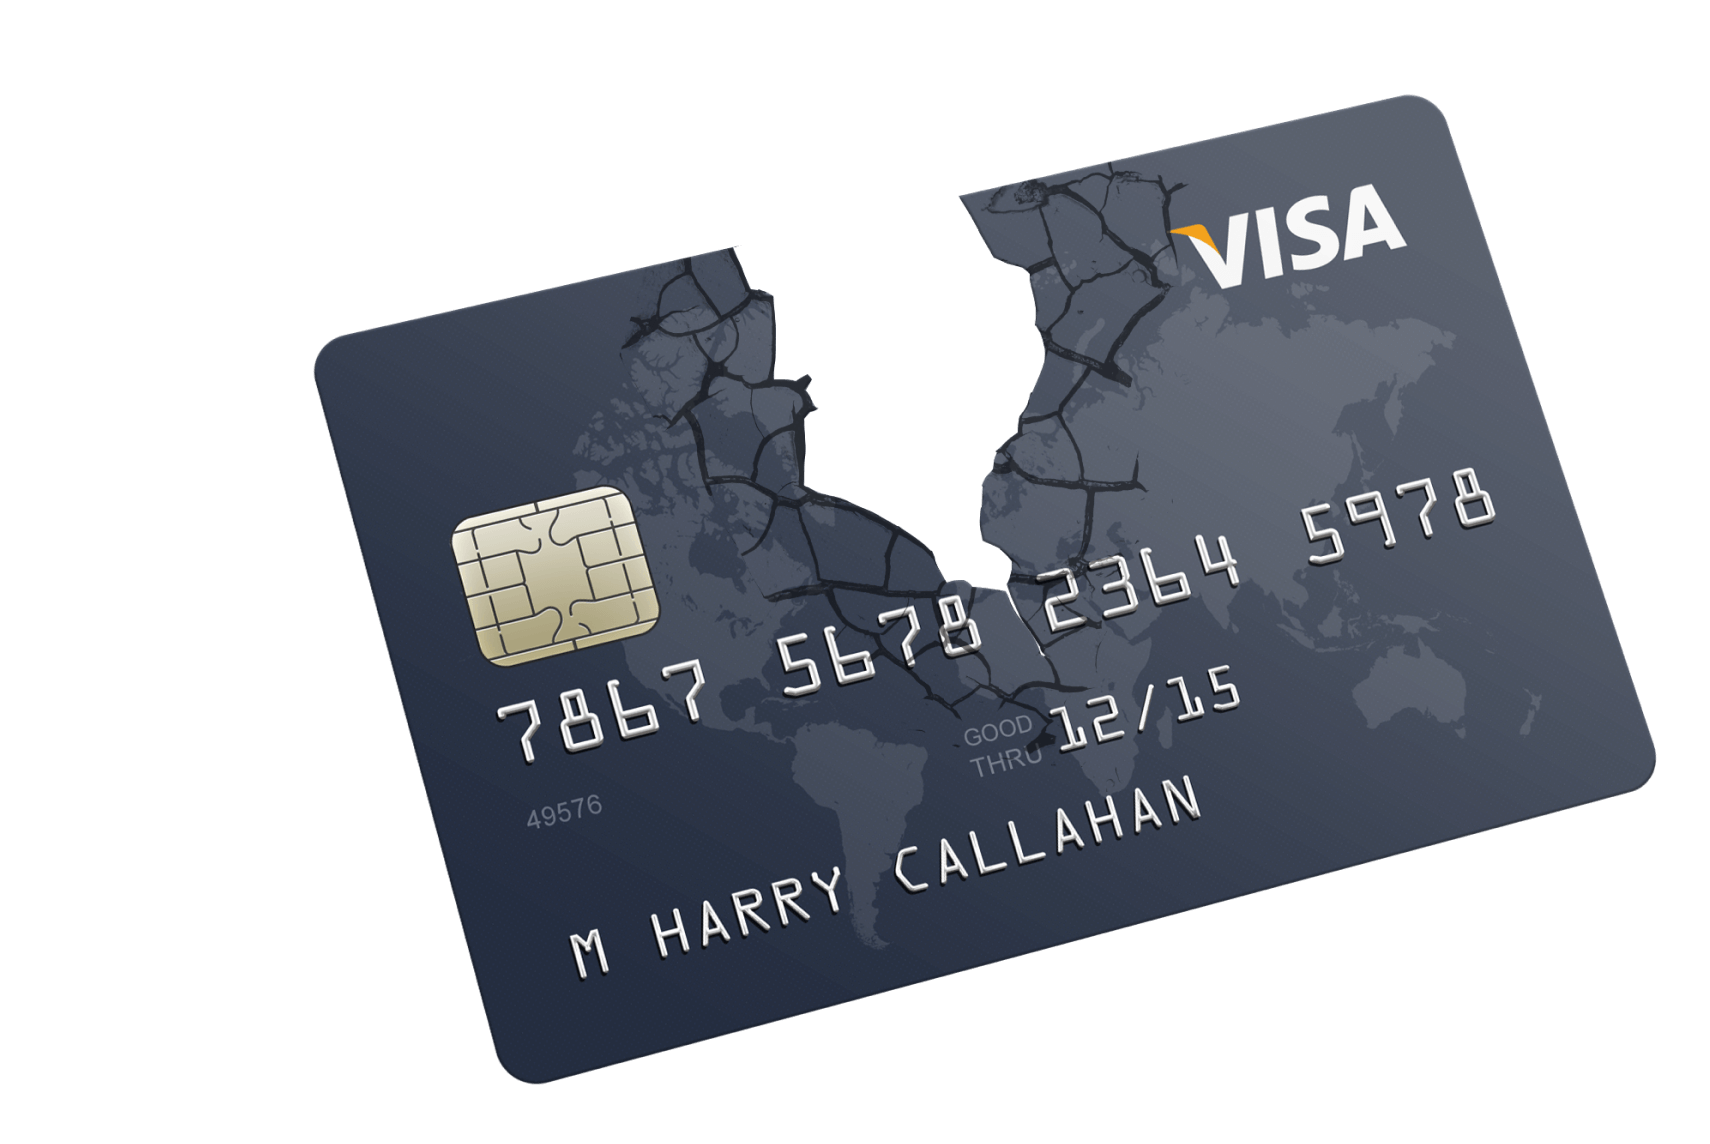 broken credit card